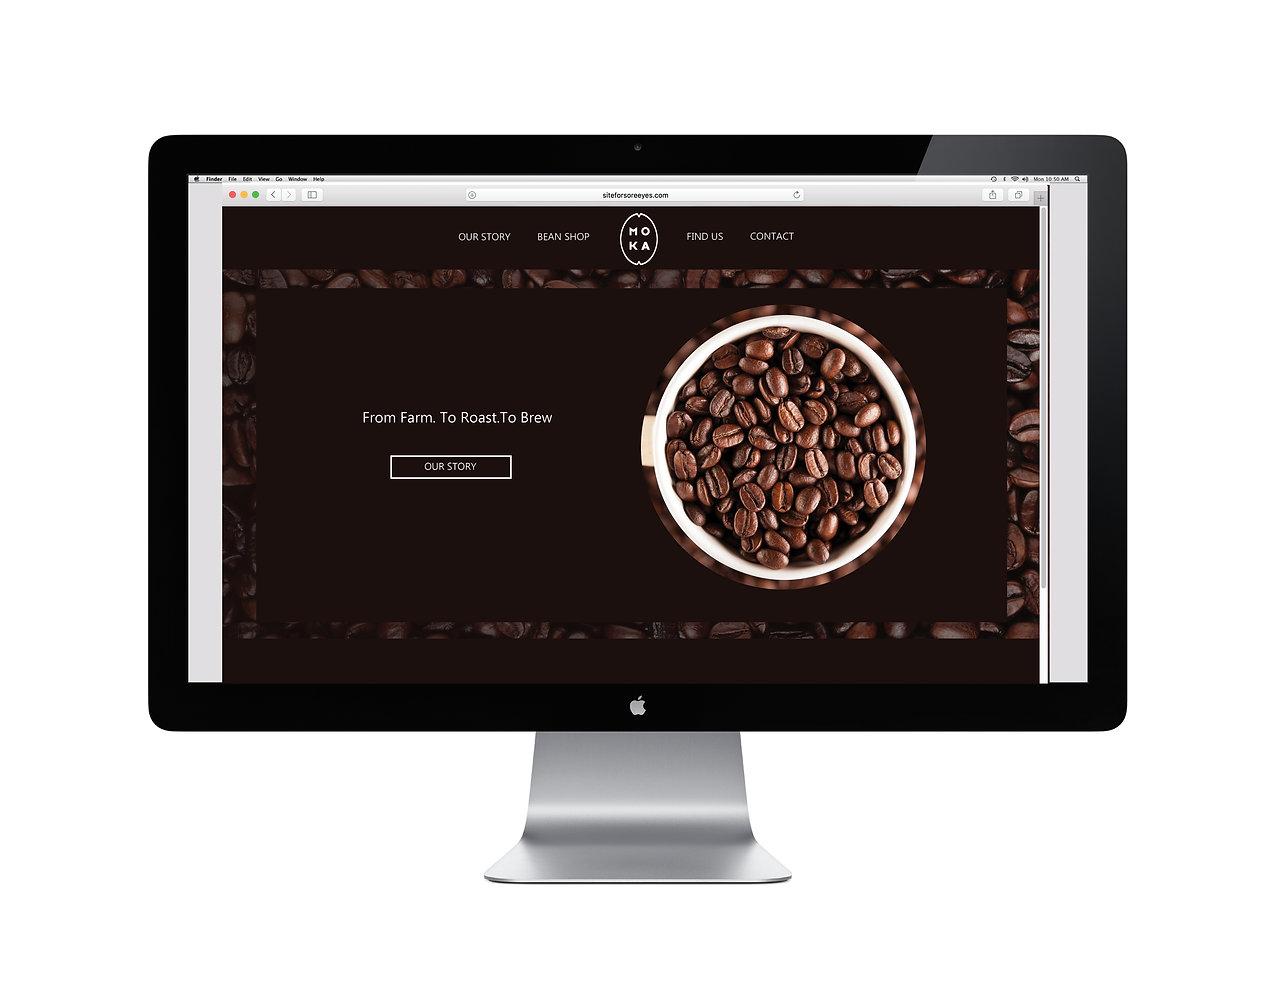 desktop wbe2.jpg